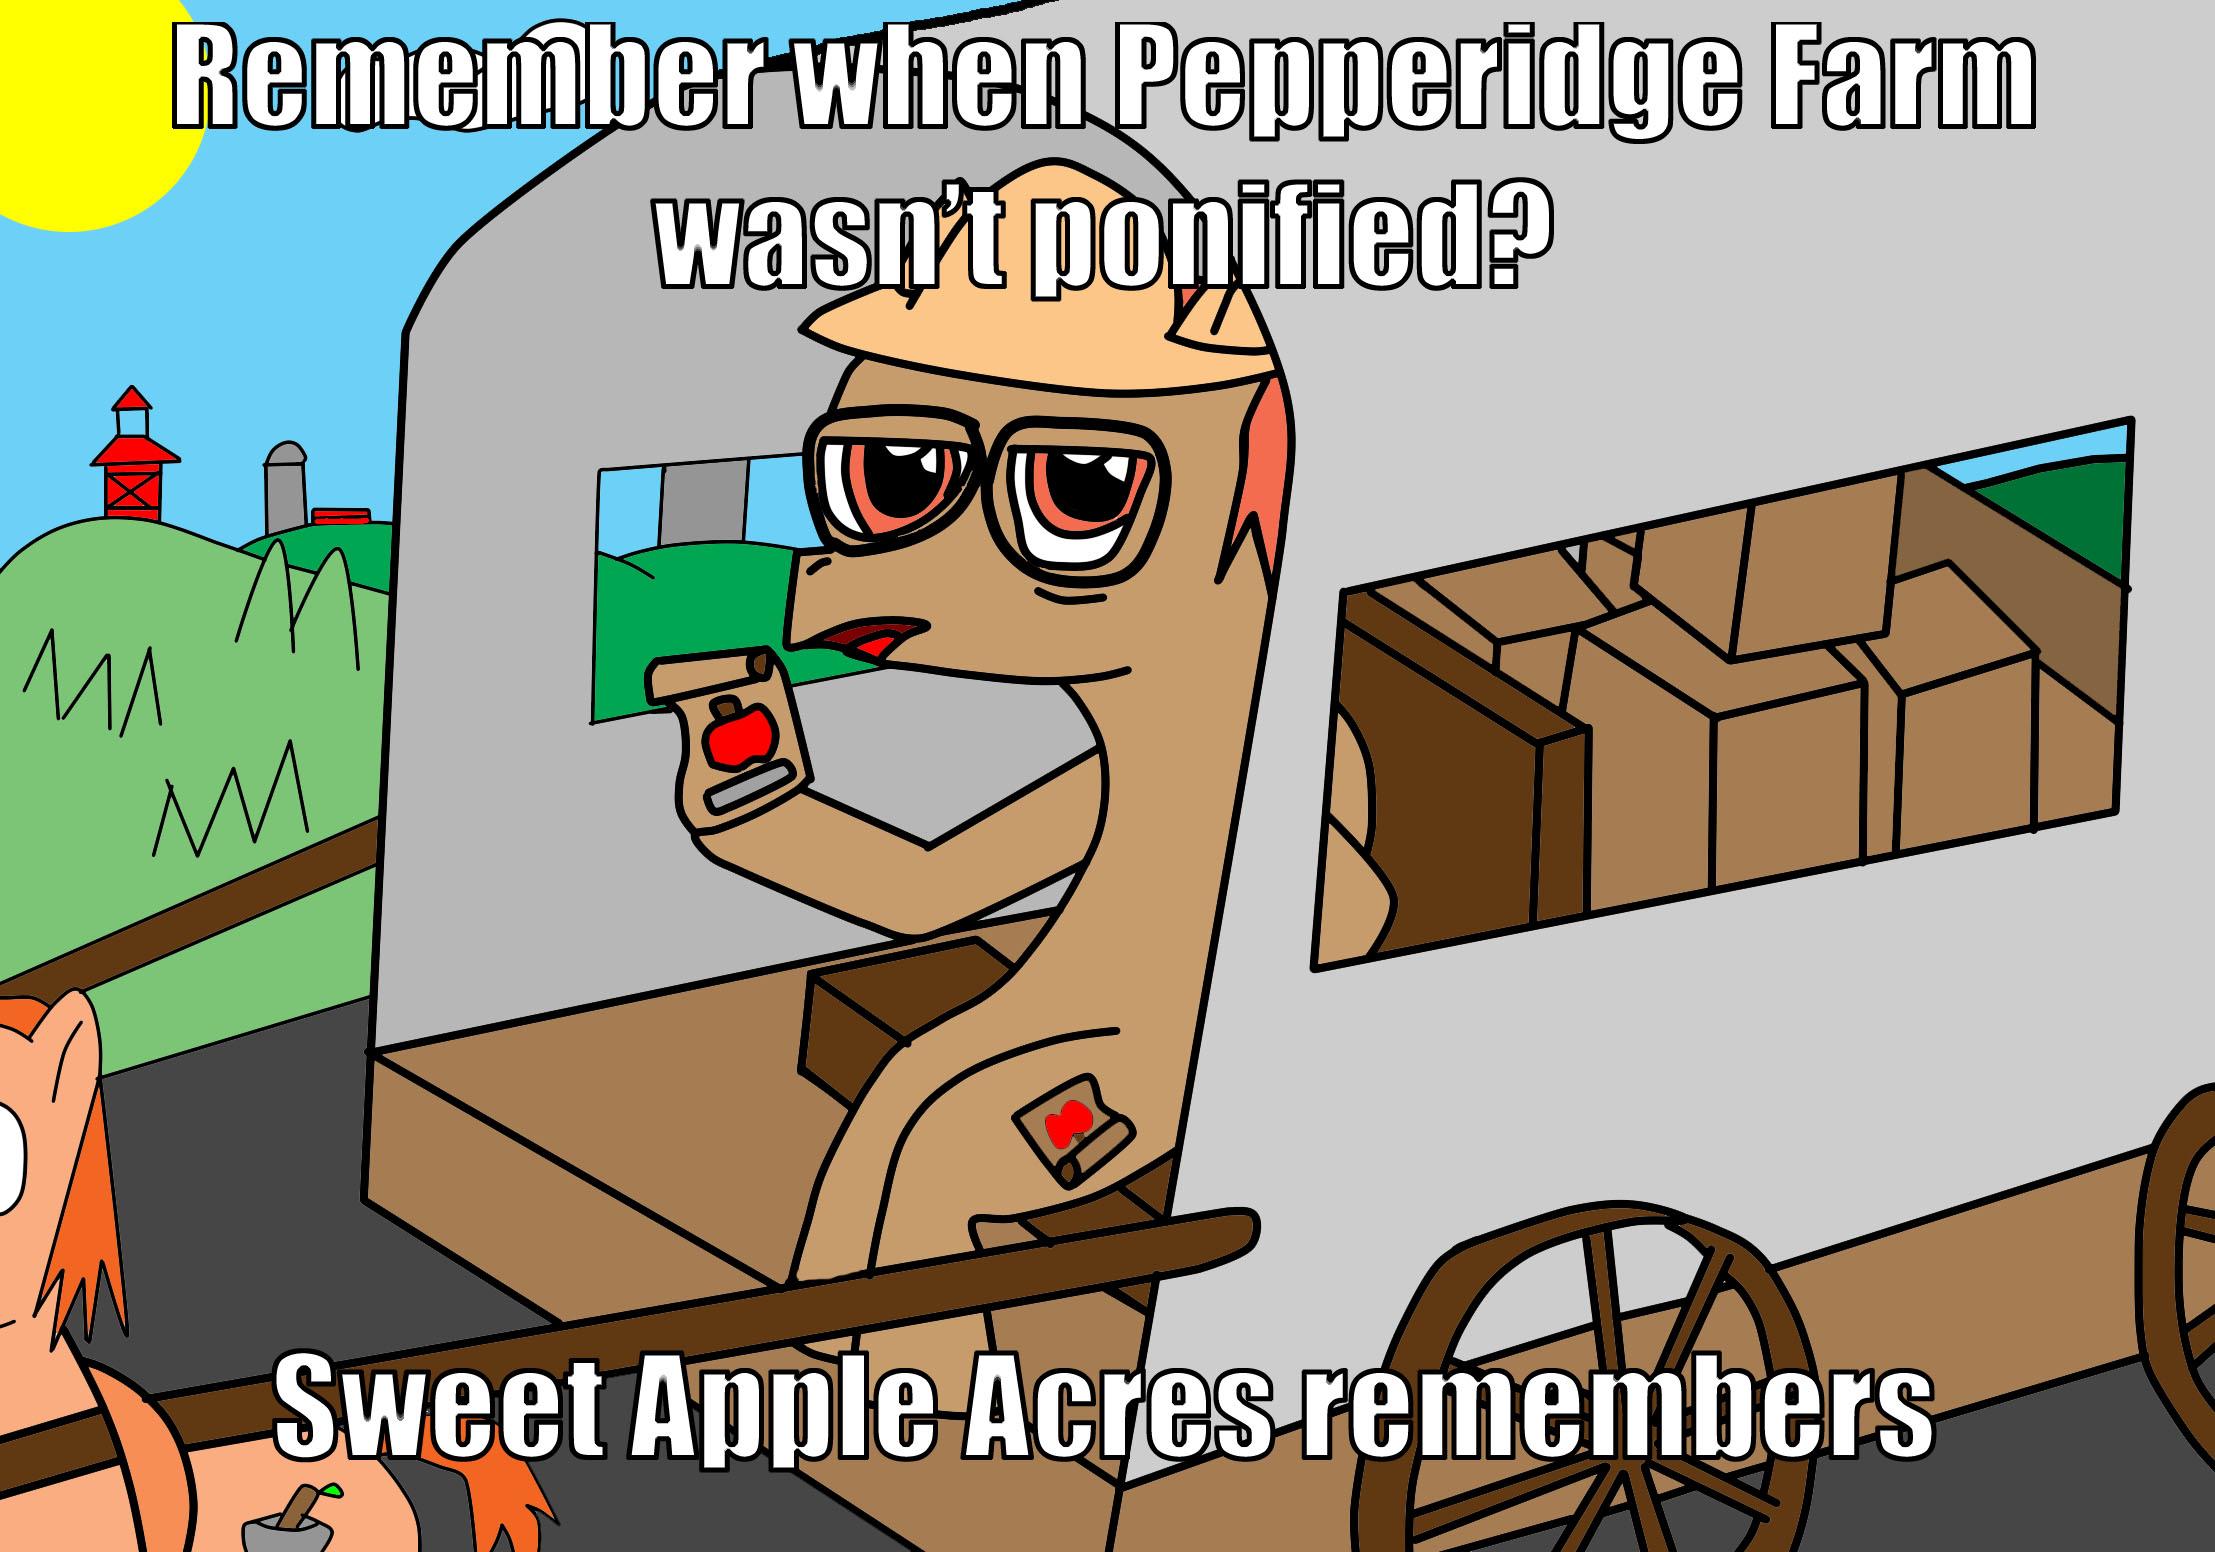 meme remembers Pepperidge farm